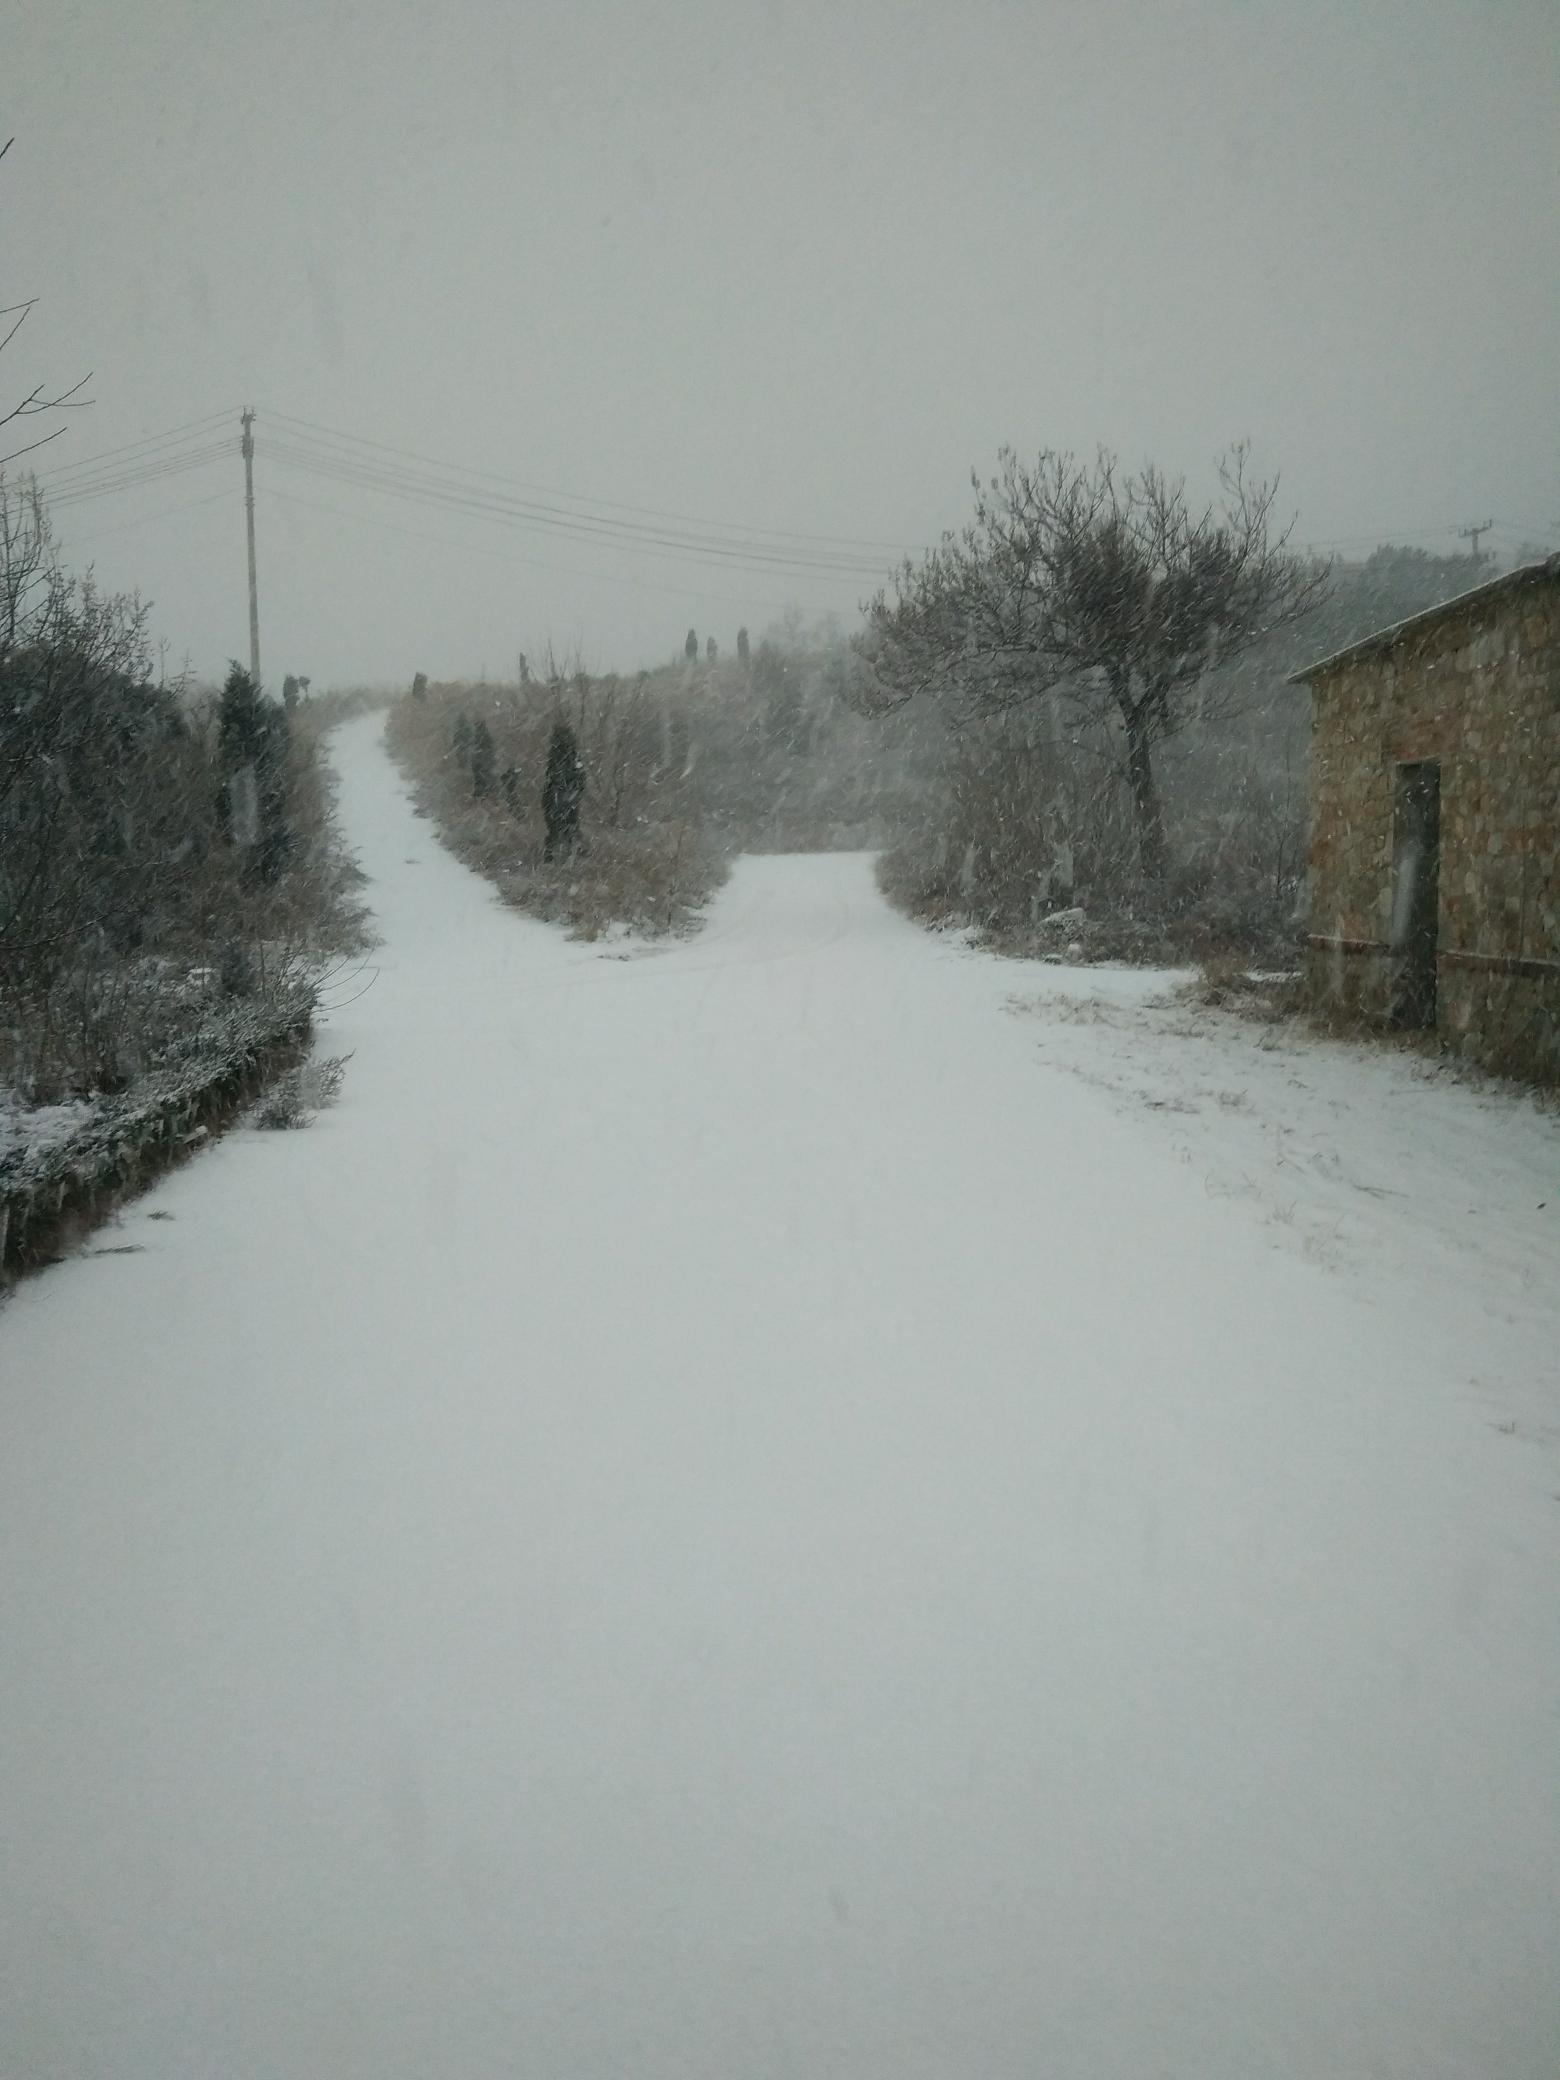 老铁们早上好又下雪了